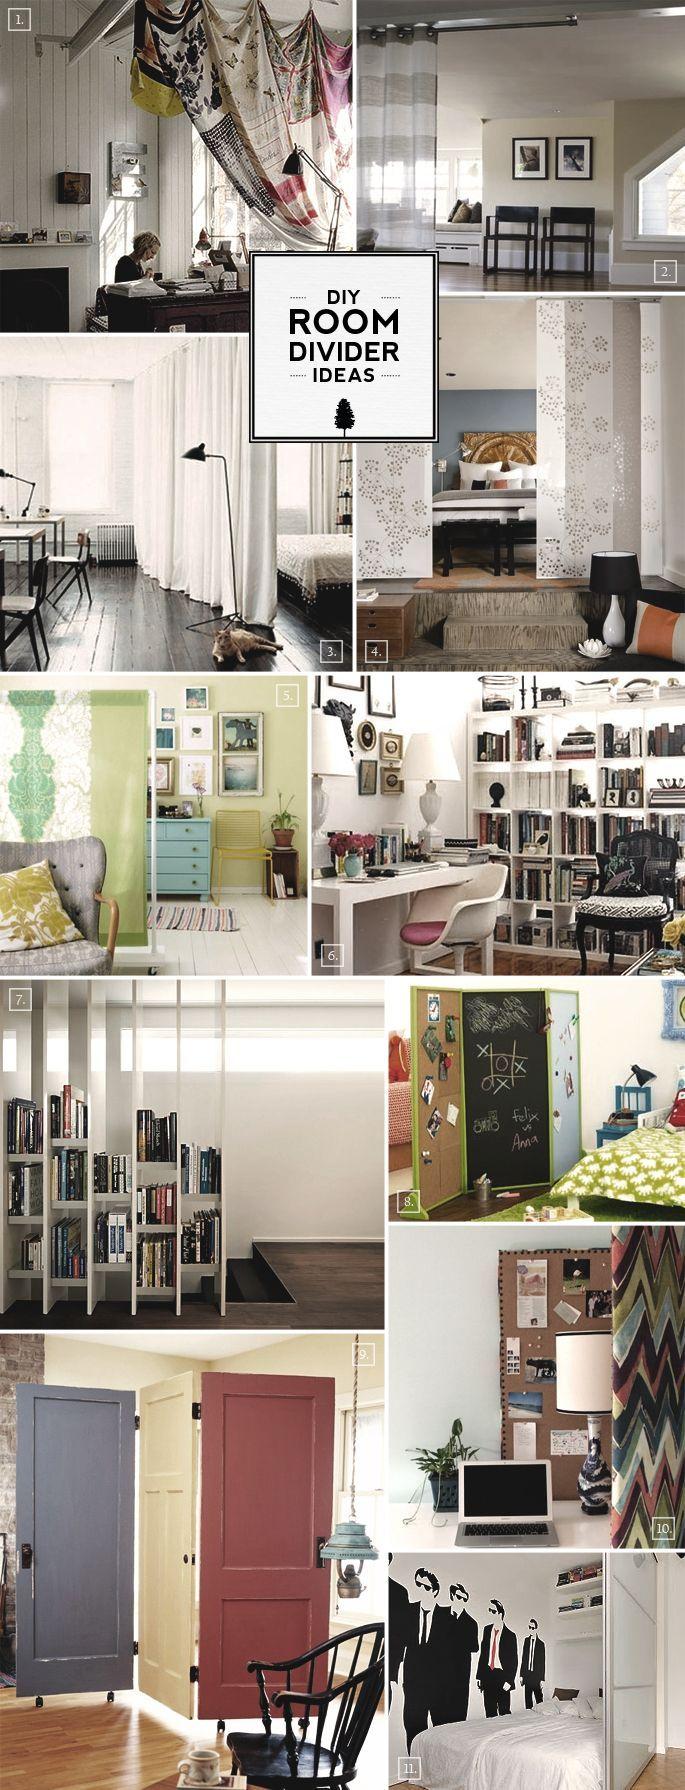 Ideas mood board diy room dividers building a home pinterest